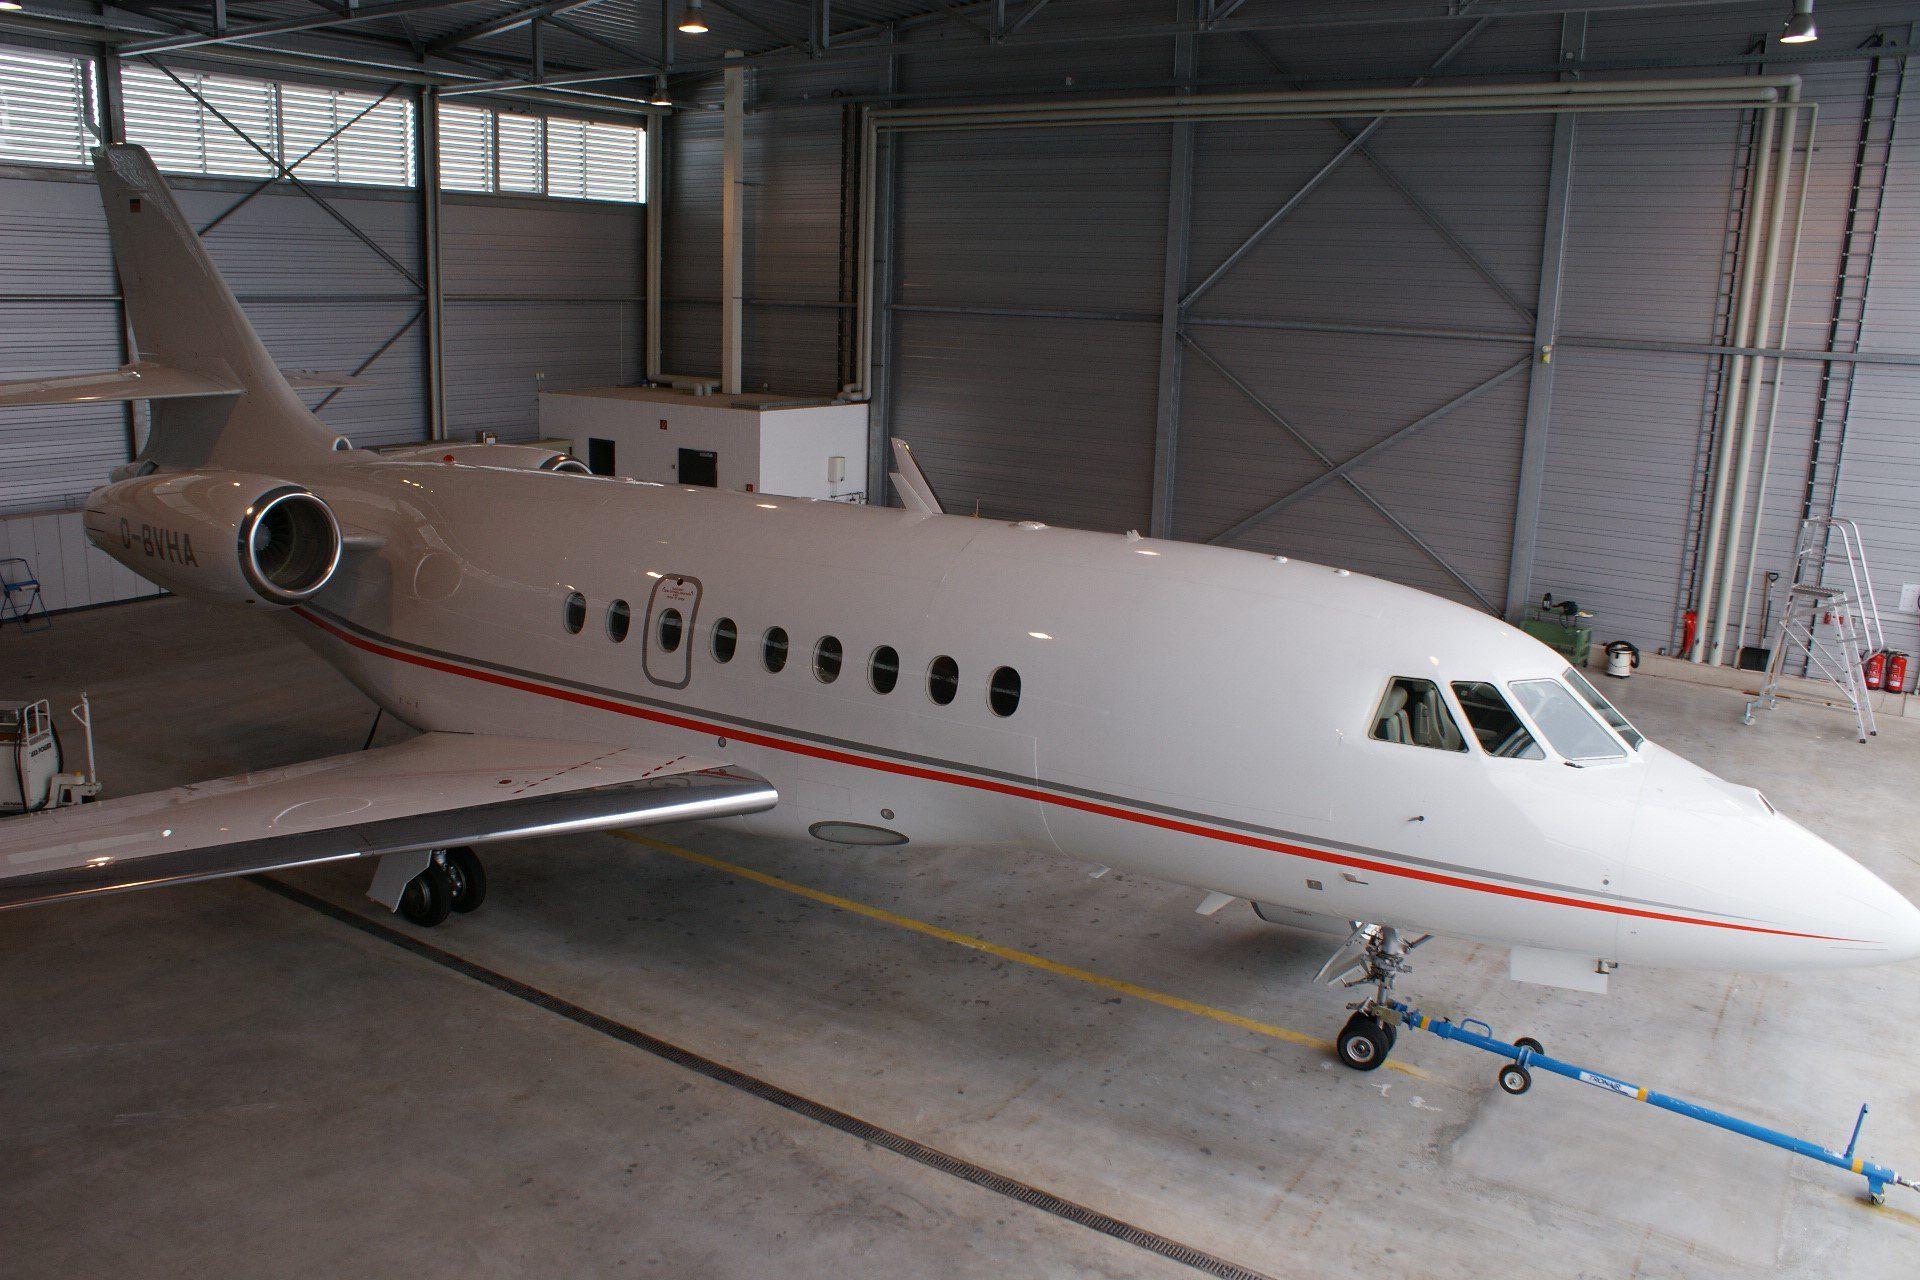 USAircraftSale-2013-Dassault-Falcon-2000LXS-2-263-03172017